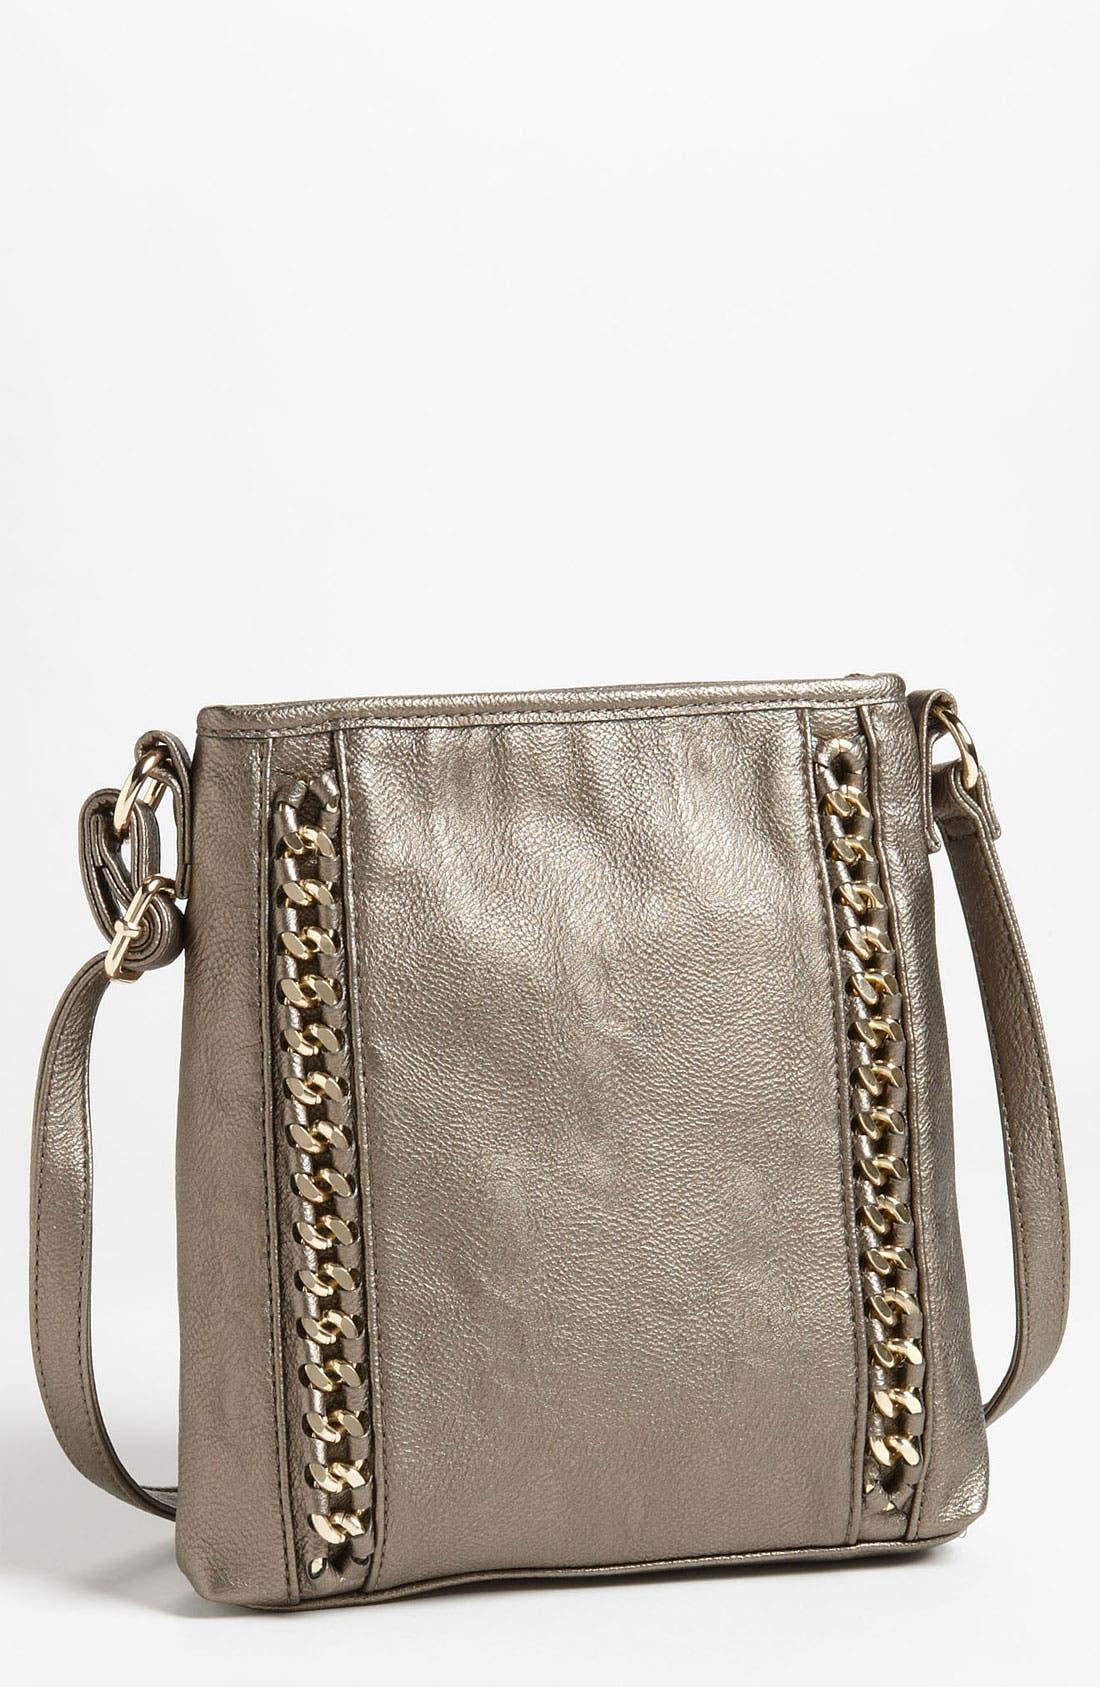 Alternate Image 1 Selected - LaTique 'Lucia' Crossbody Bag